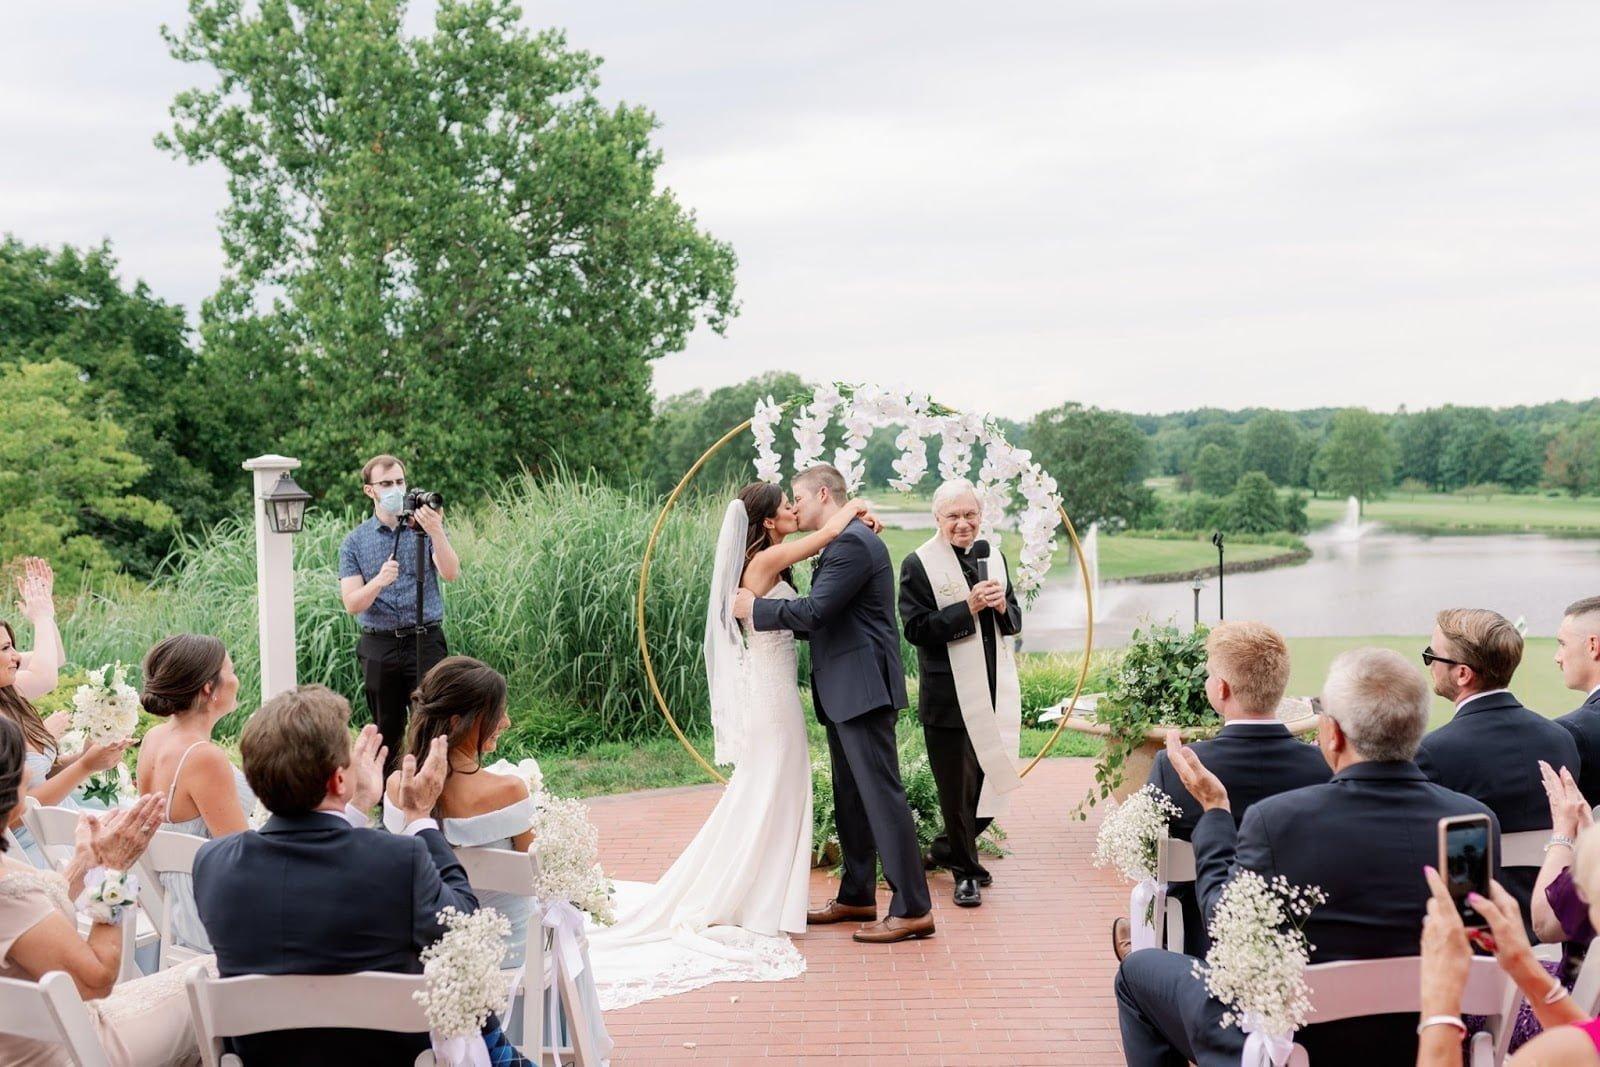 Brooklake outdoor wedding ceremony in Northern NJ, Morris County